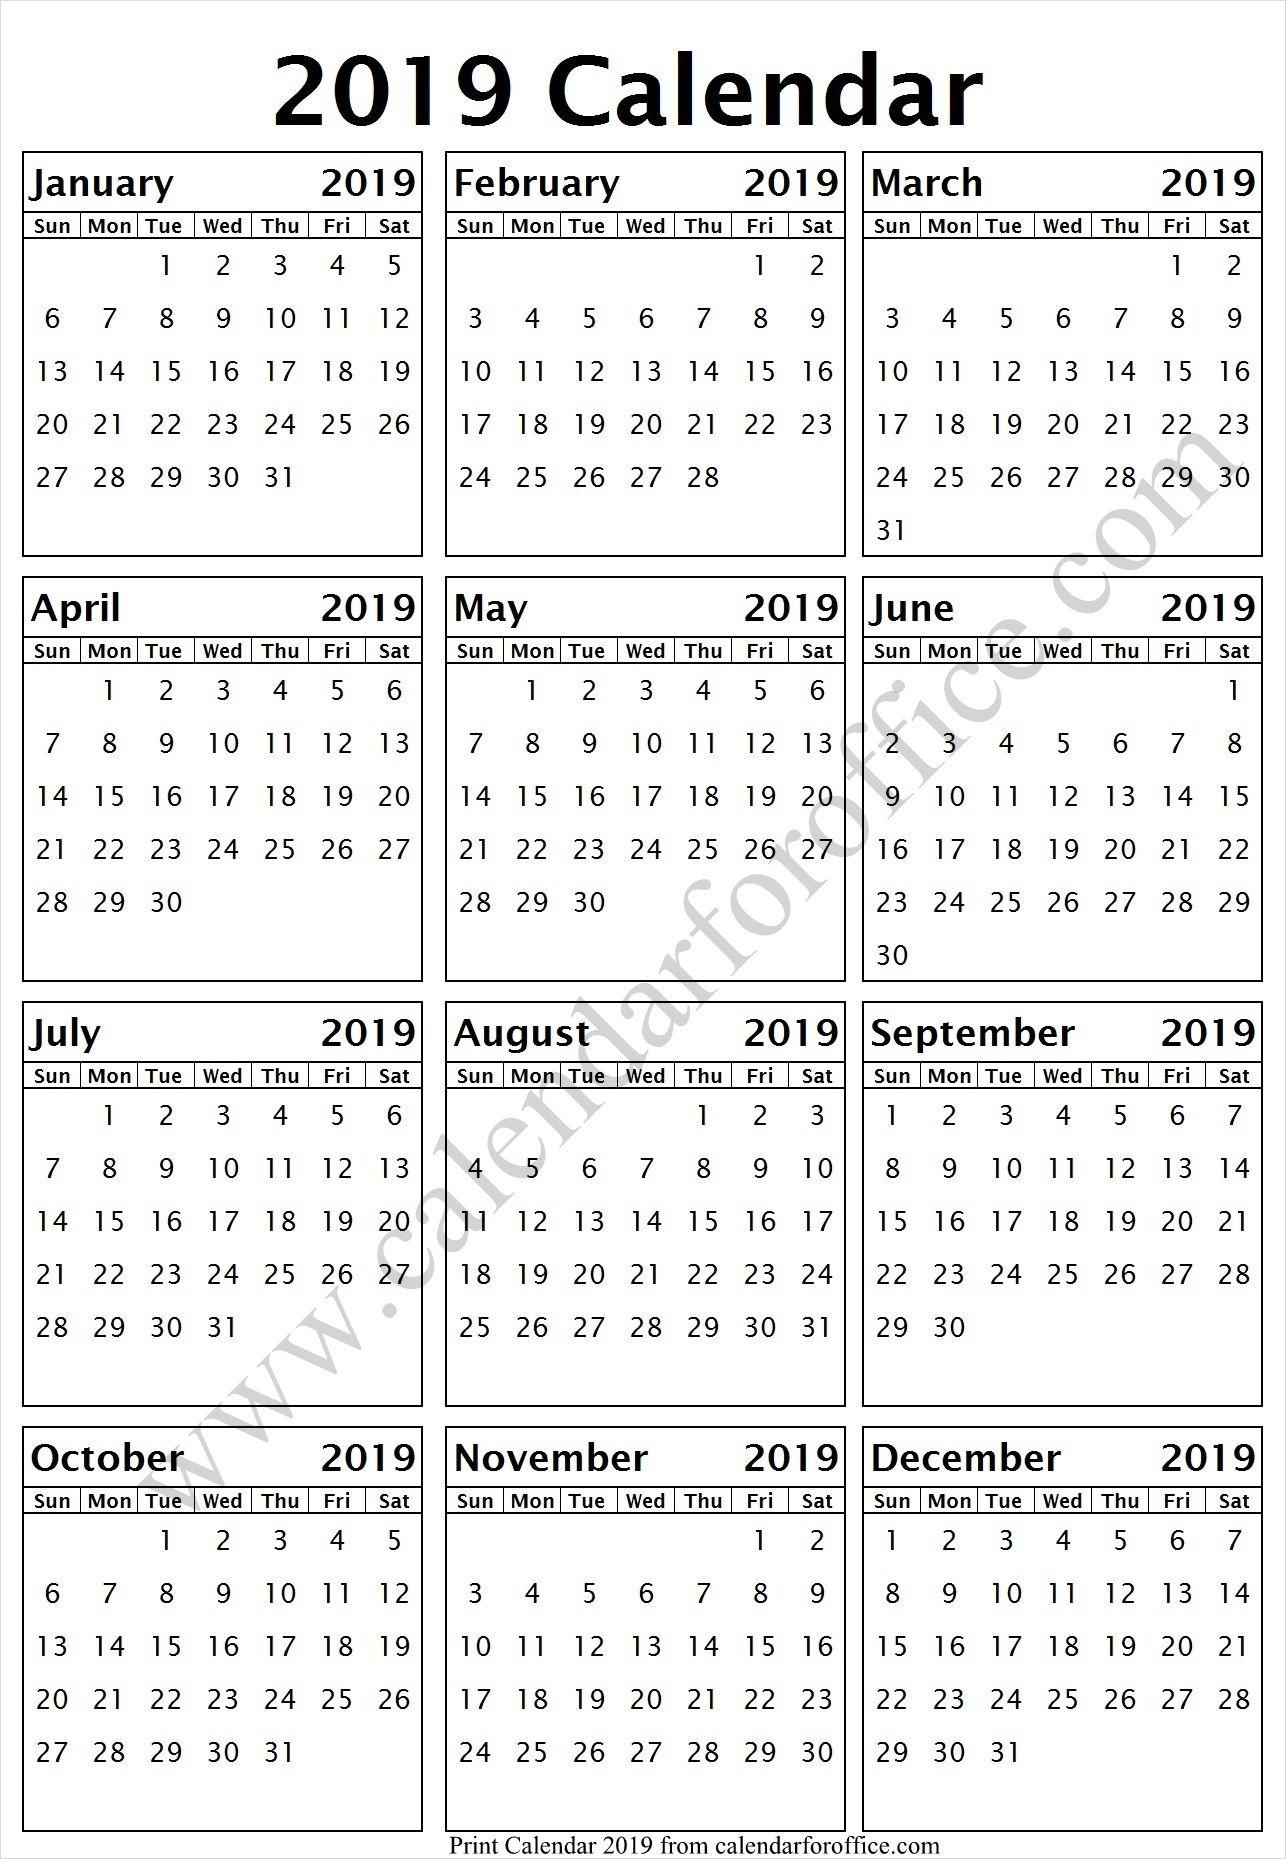 Day Calendar 2019 Sri Lanka | Calendar, Templates, 2019 Calendar